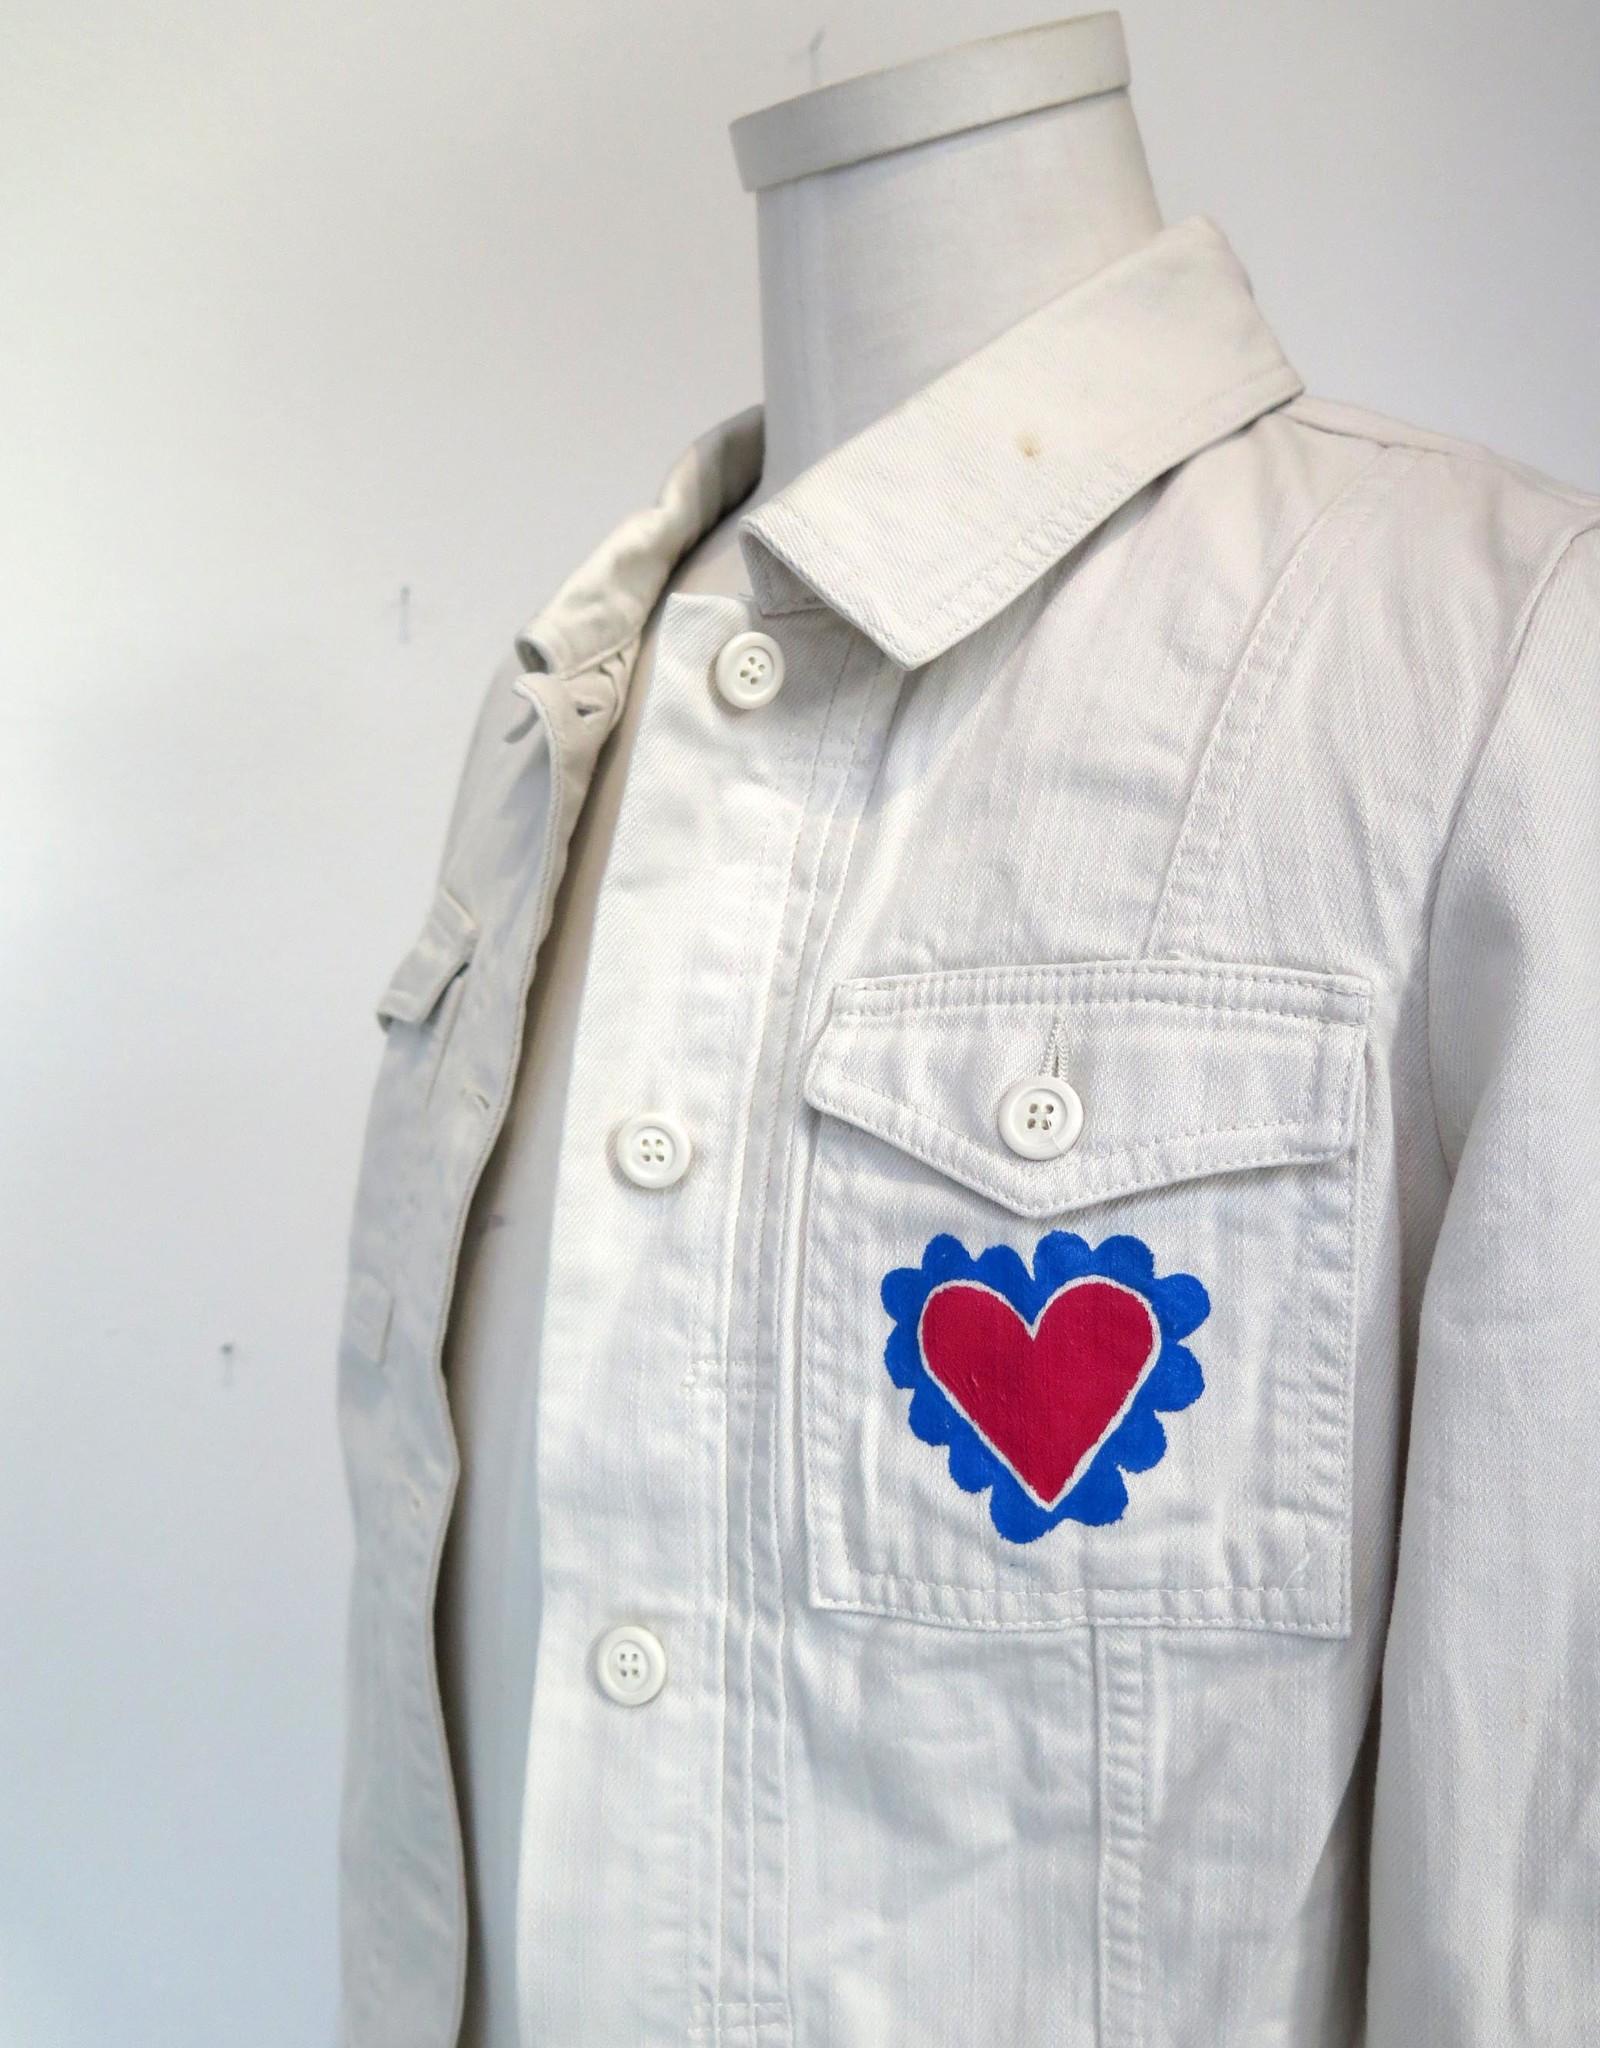 "AMCV ""VIVIR"" textile paint on denim jacket by AMCV"